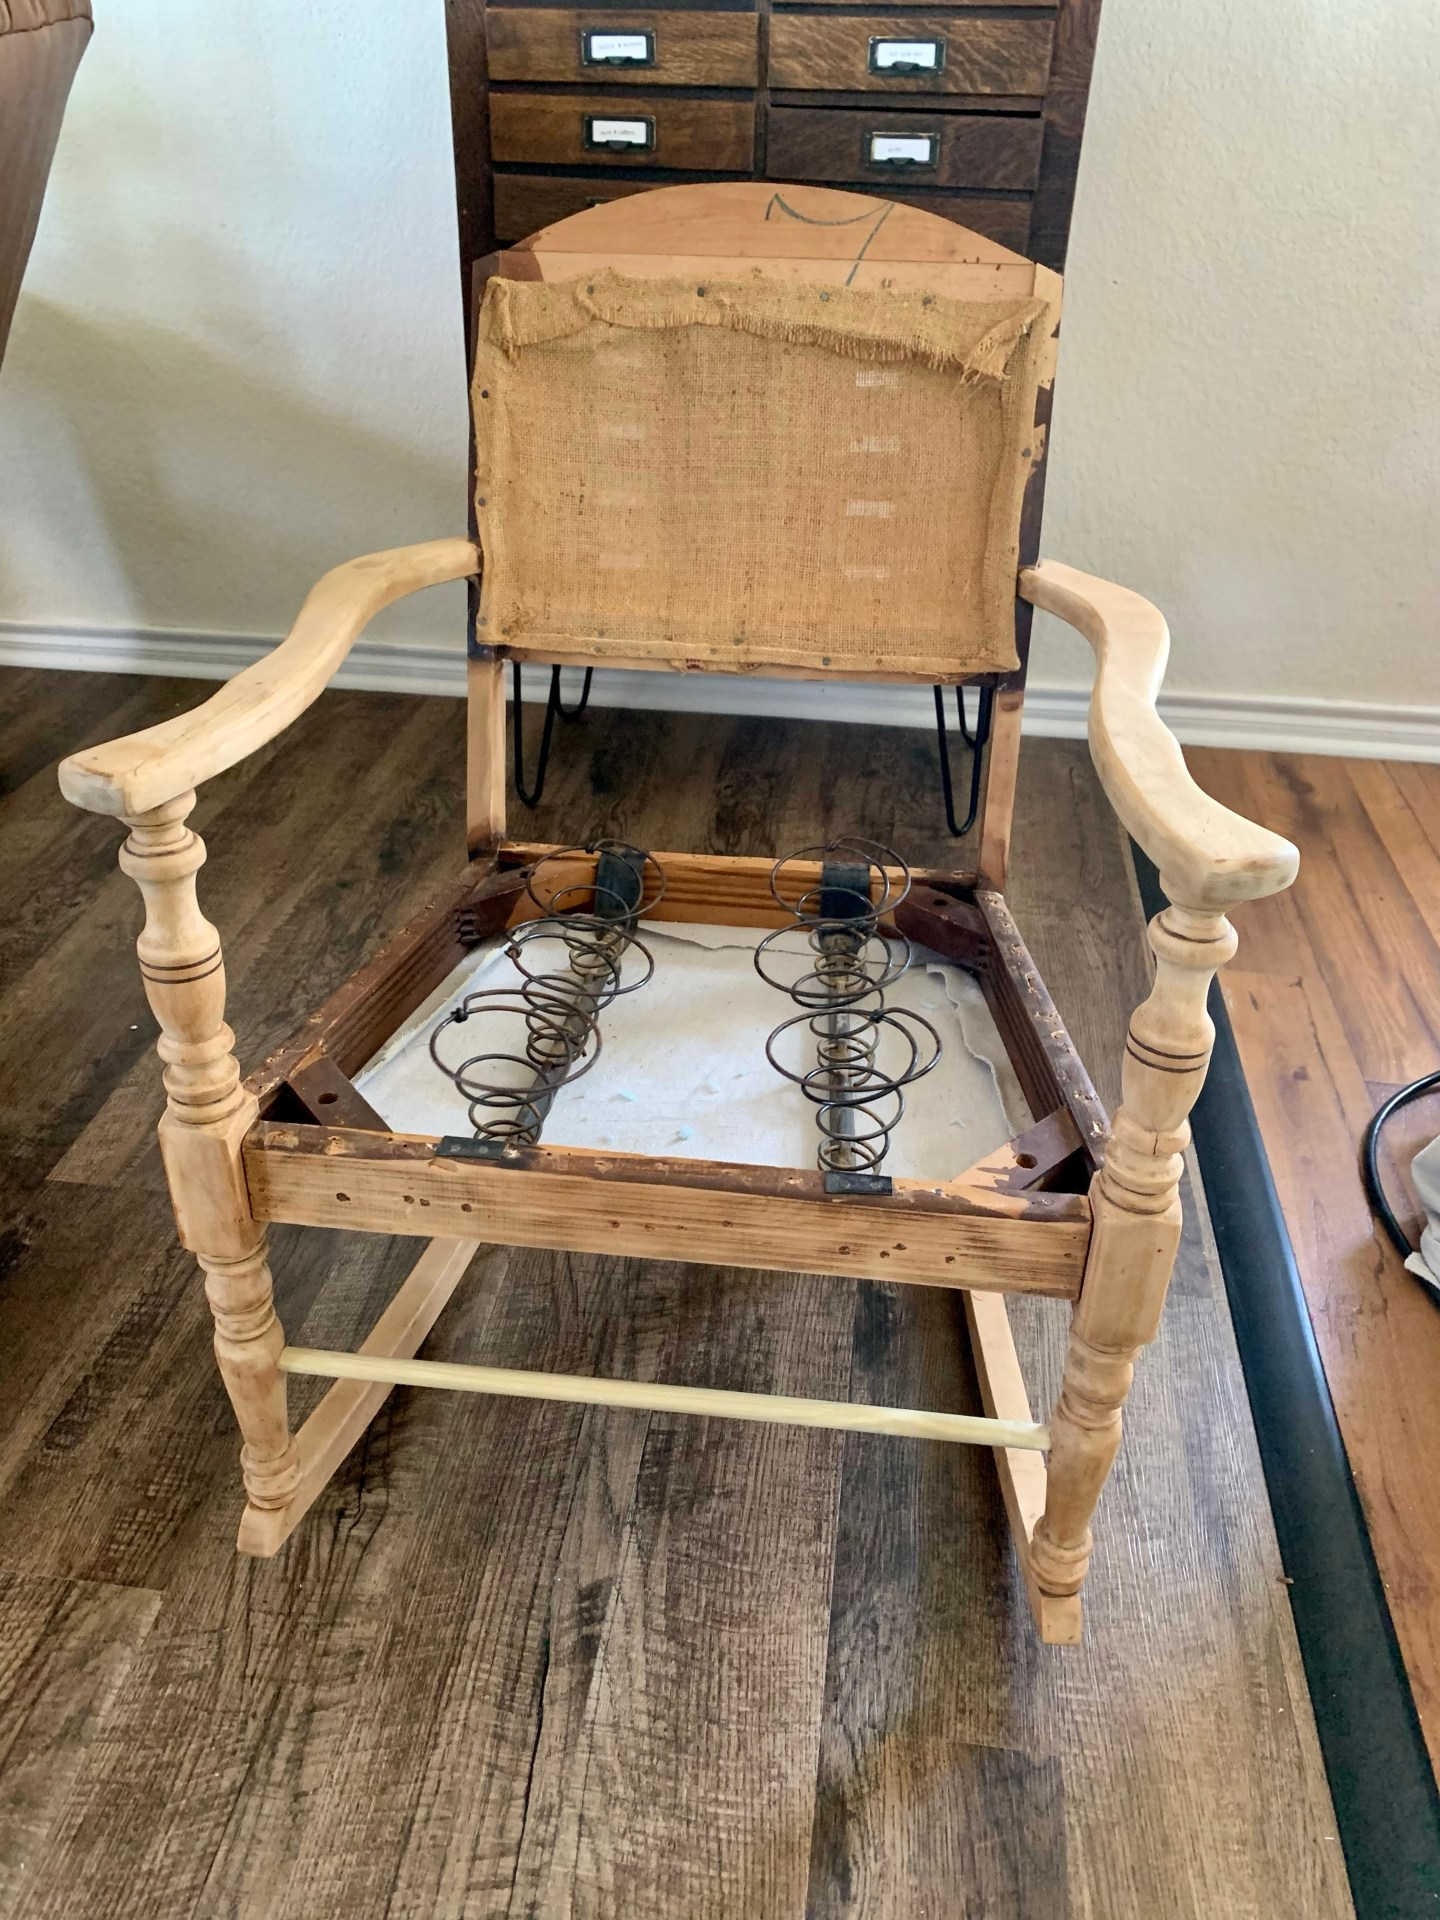 Refurbishing an antique rocking chair.